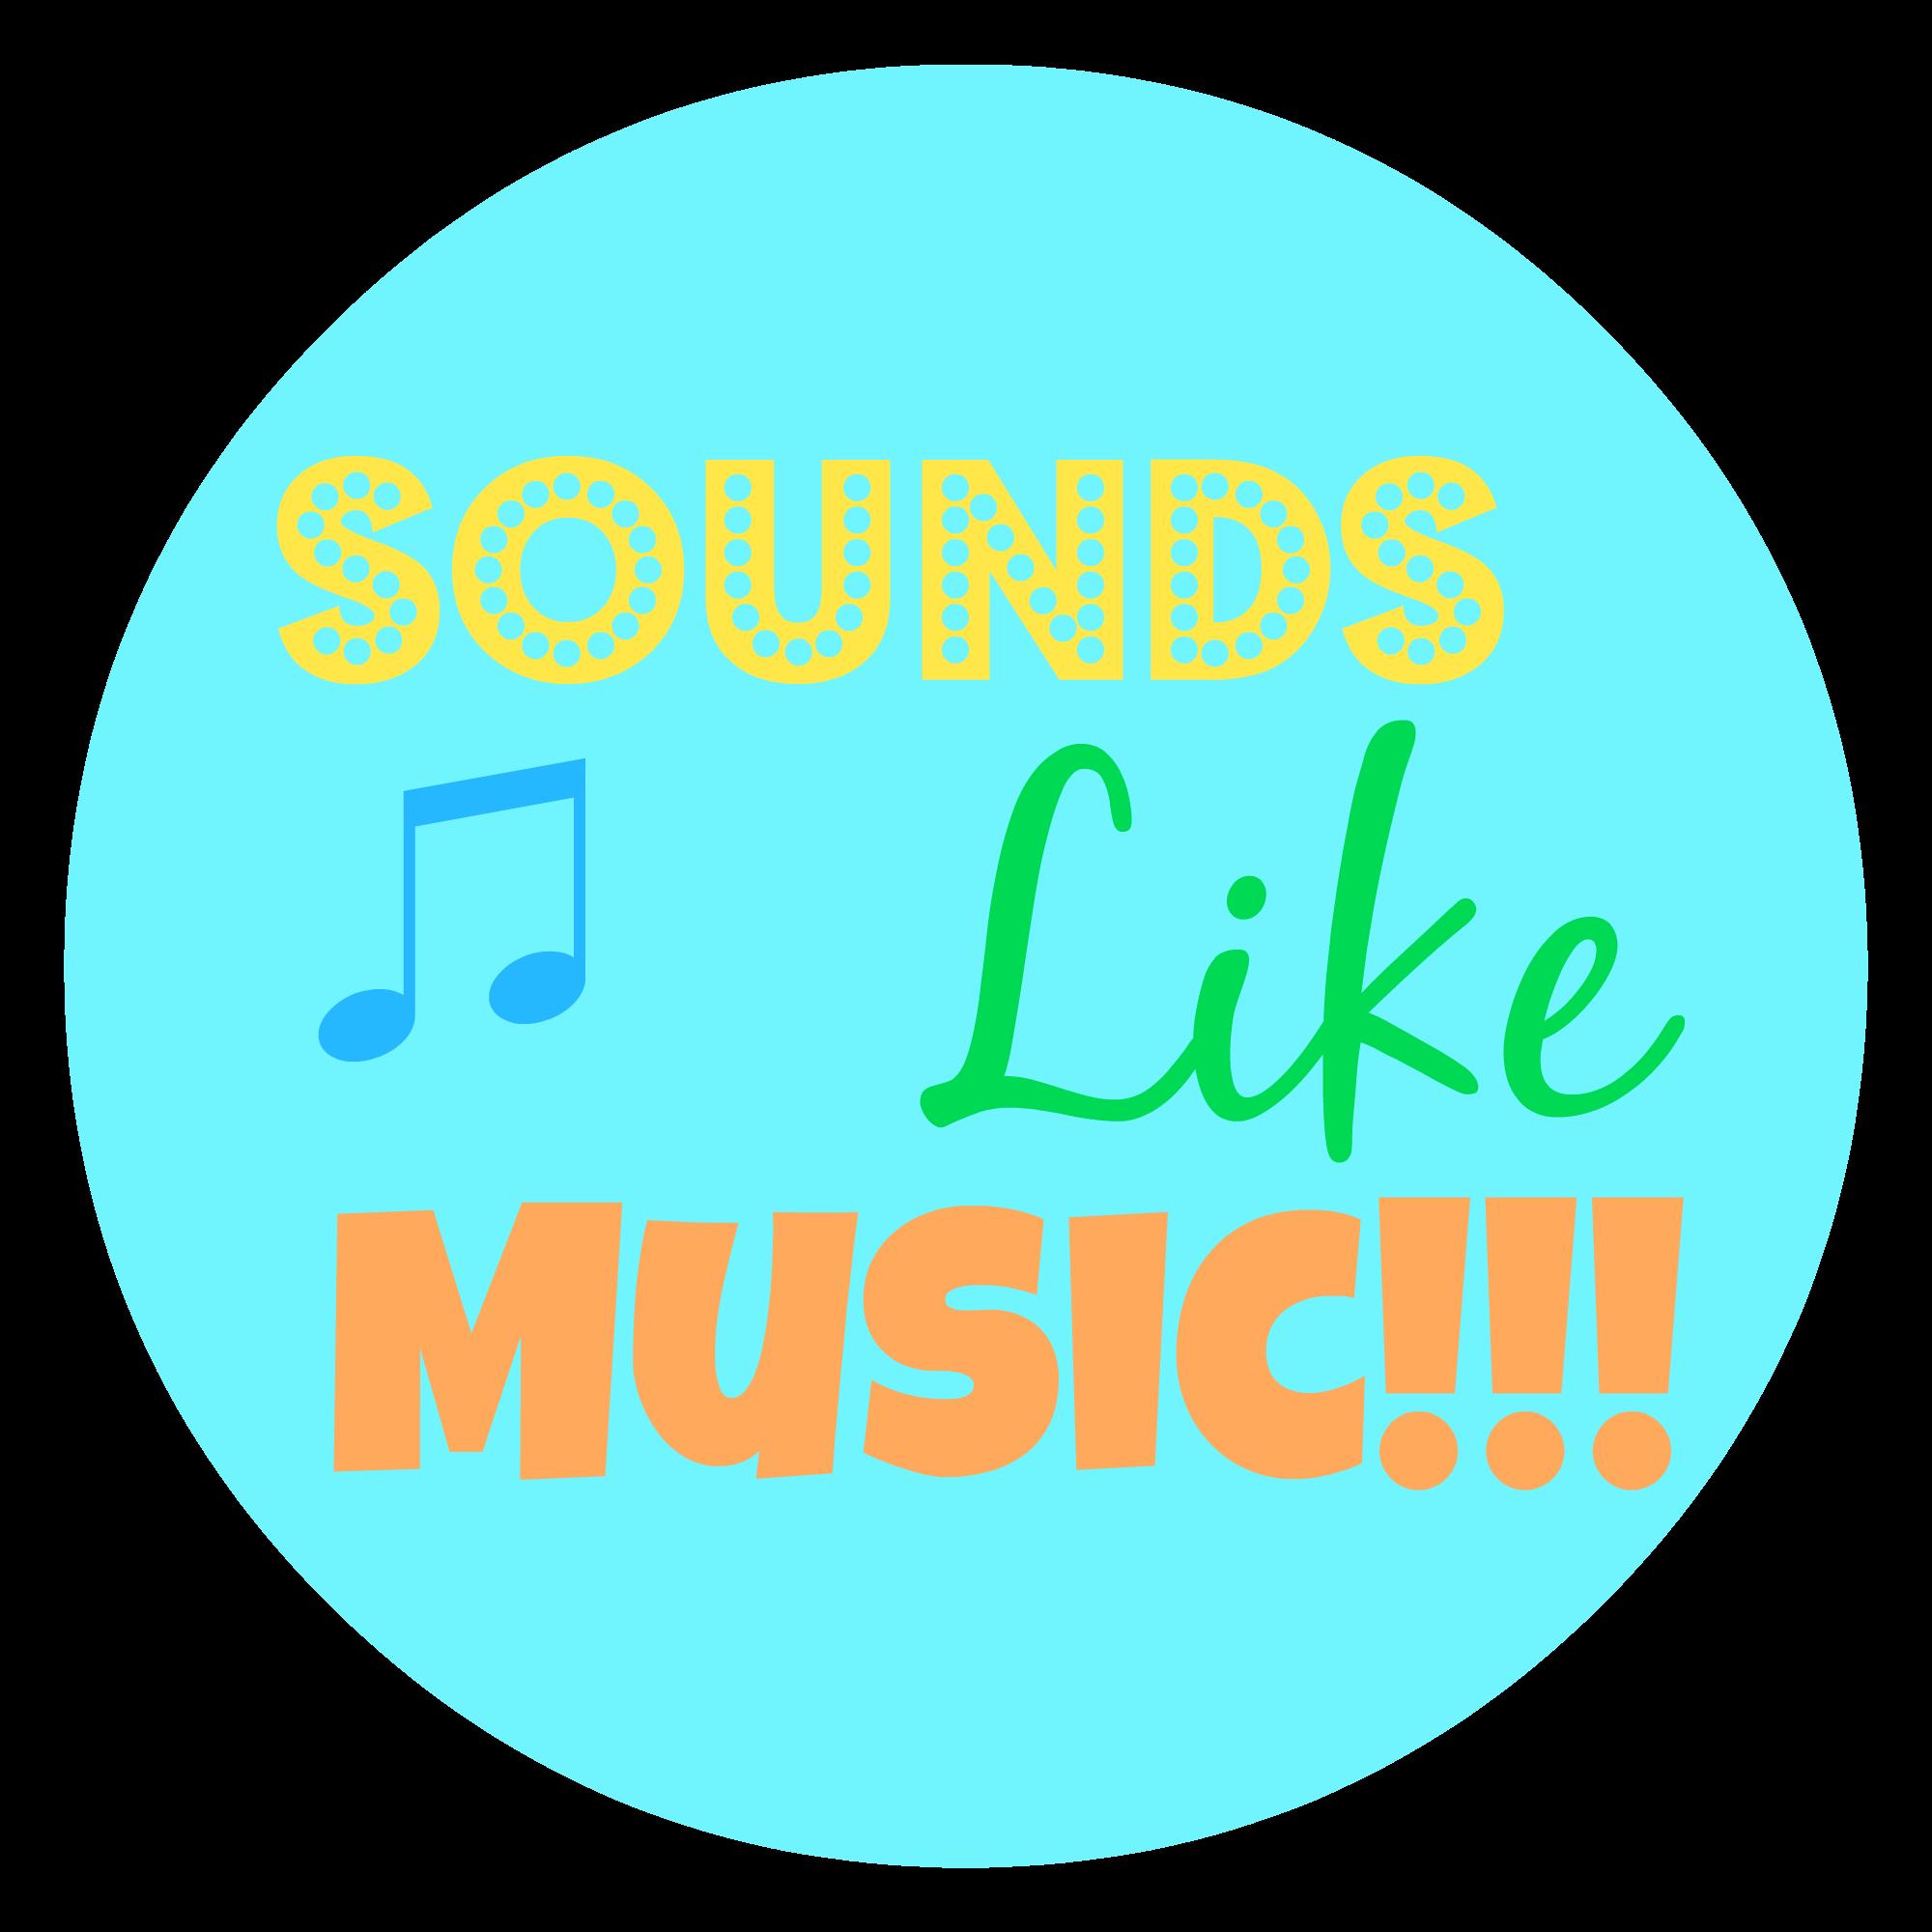 Sounds like music!